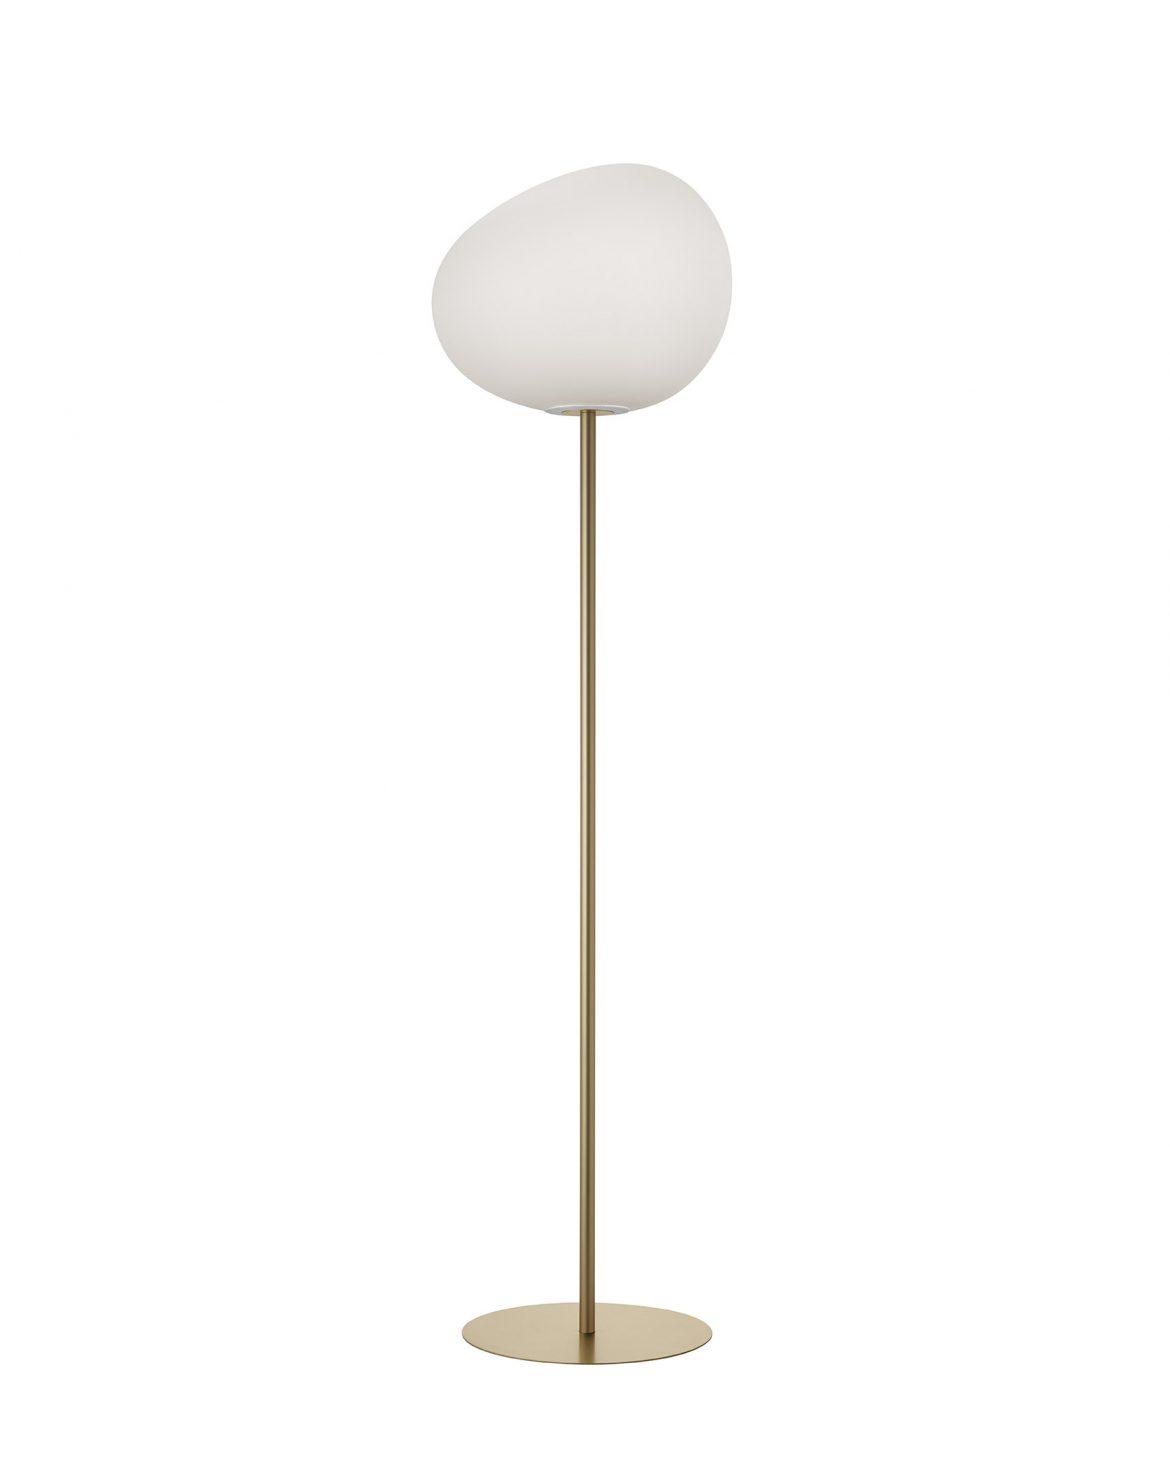 floor lamps 20 Floor Lamps That Will Transform Your Space – PART II FOSCARINI